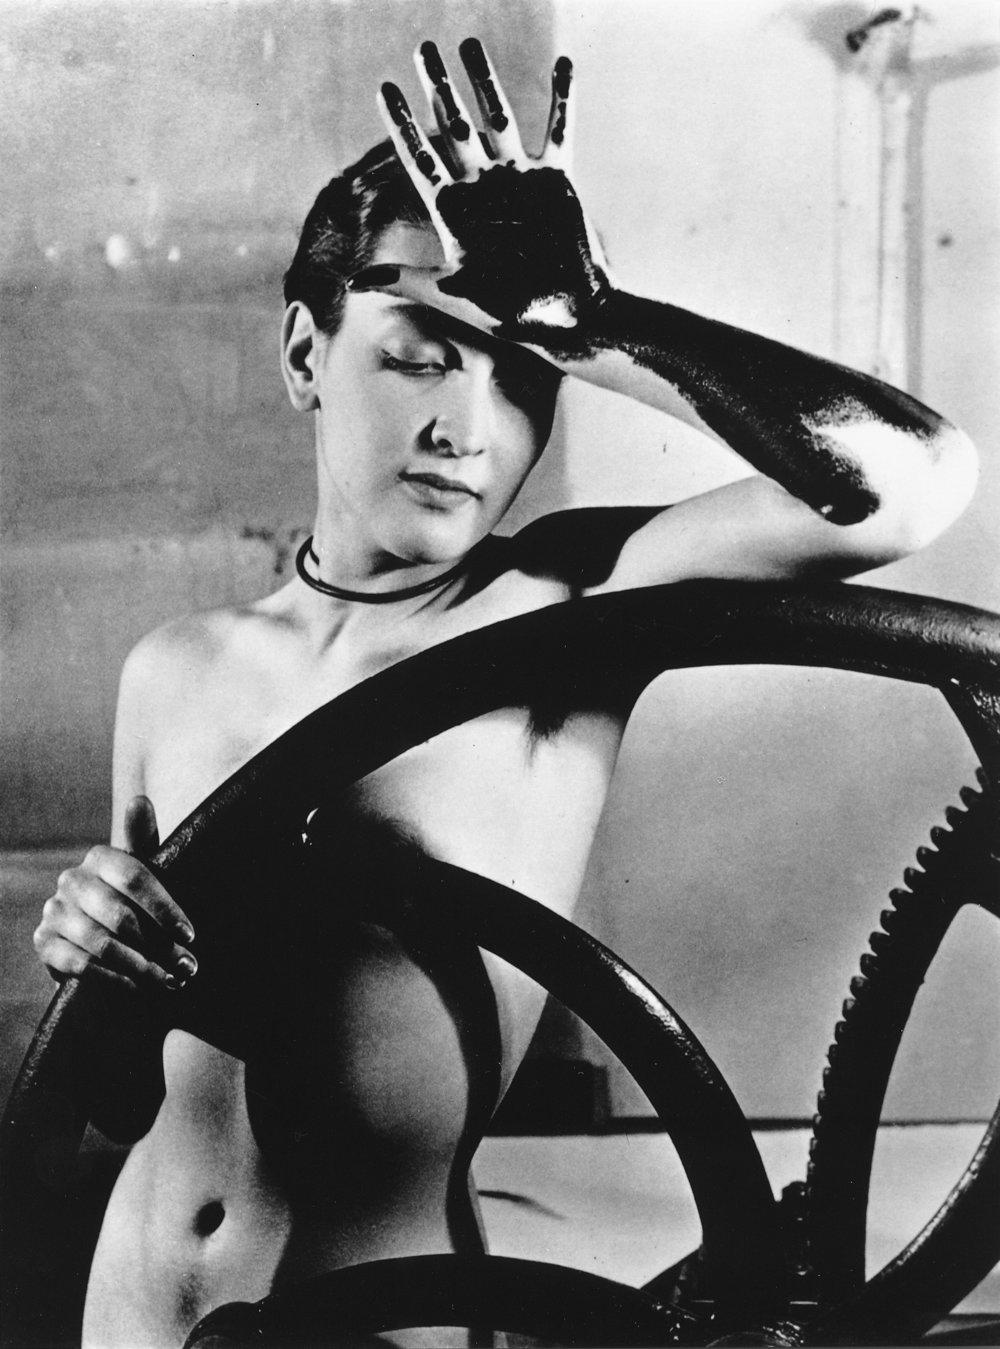 Man Ray: Erotique voilée, 1933, valokuva Malli: Meret Oppenheim